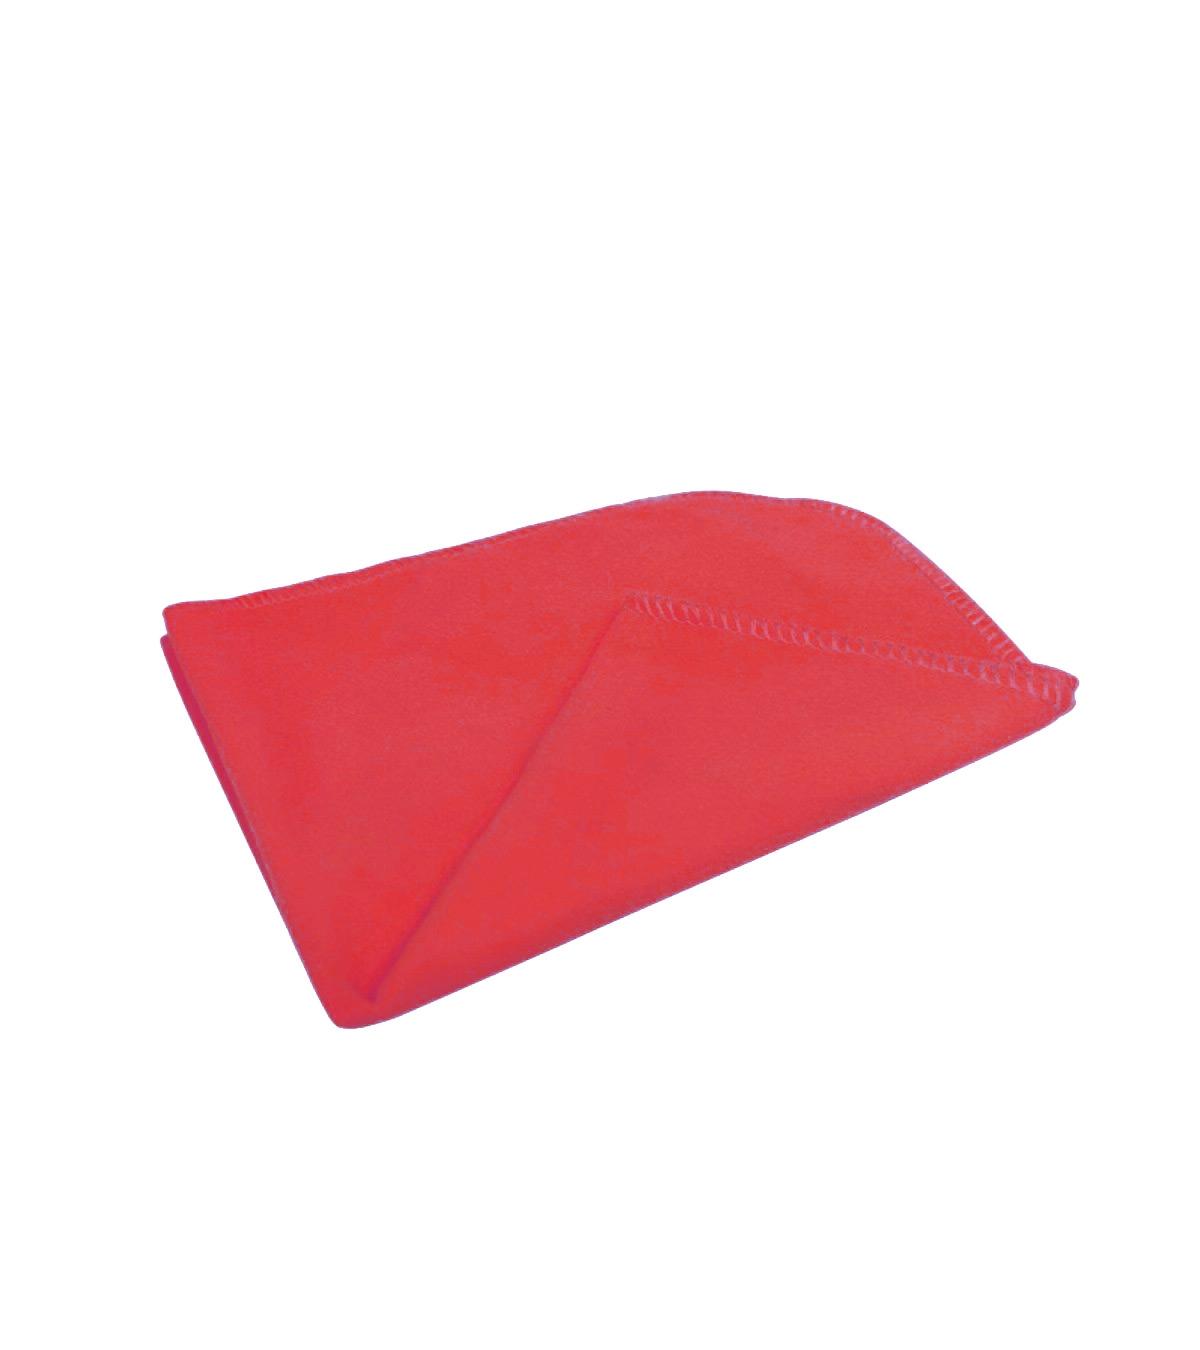 Toalla Soft towel chica